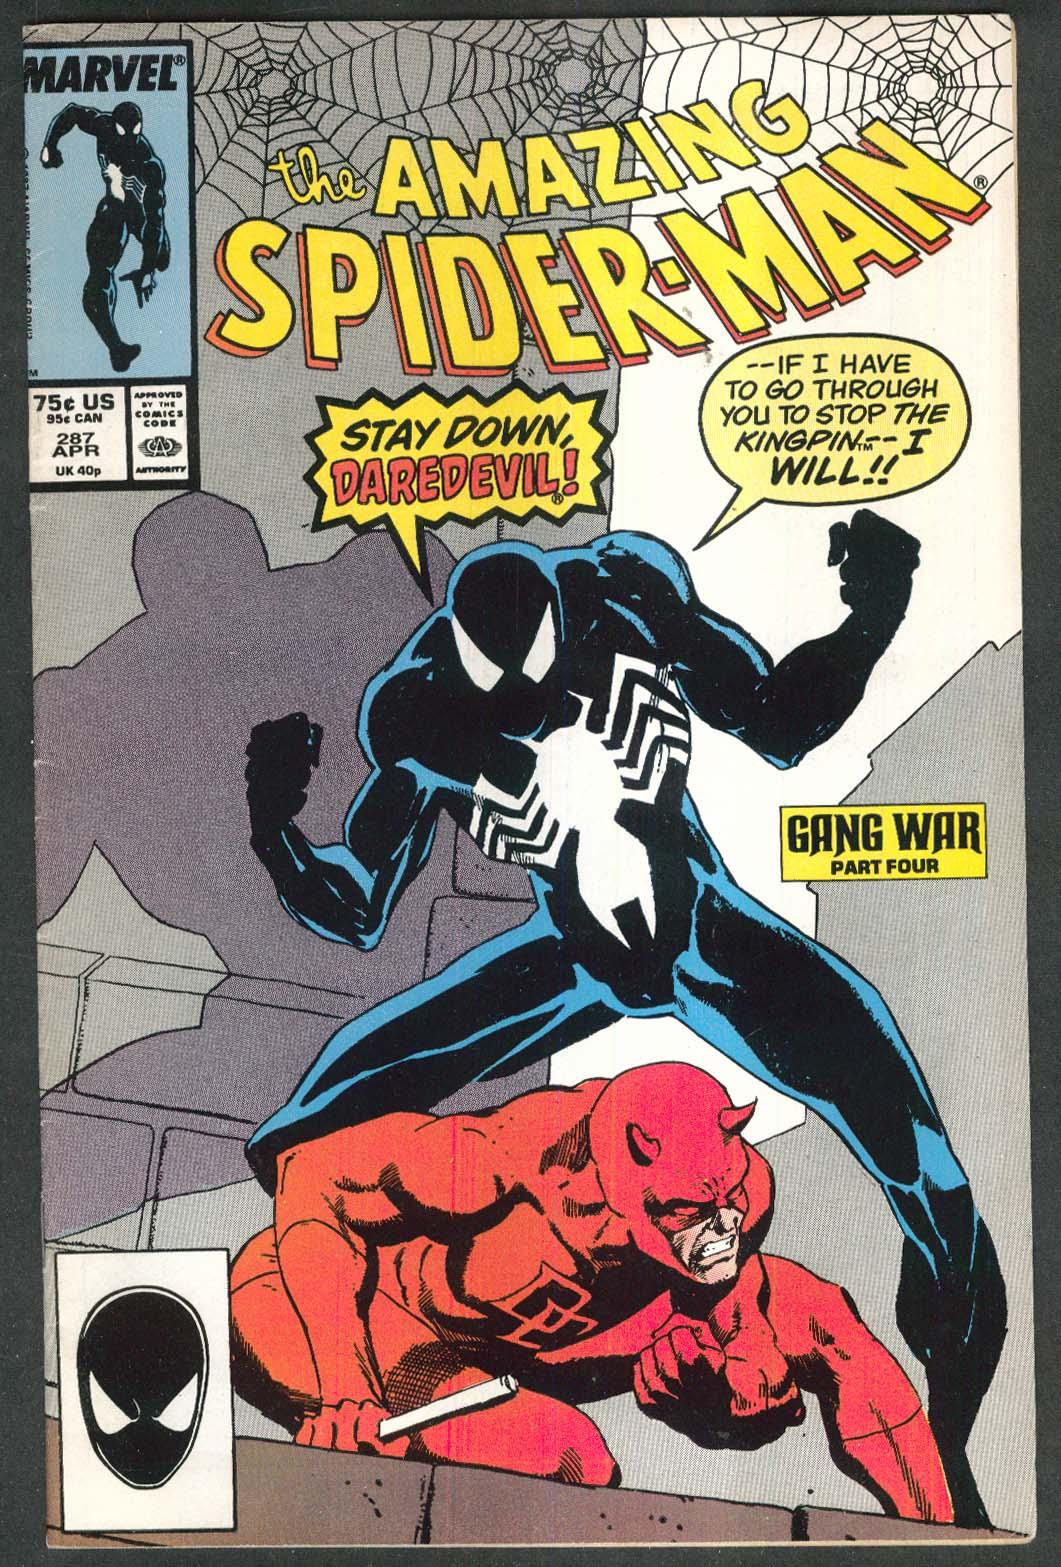 AMAZING SPIDER-MAN #287 Marvel comic book 4 1987 Daredevil